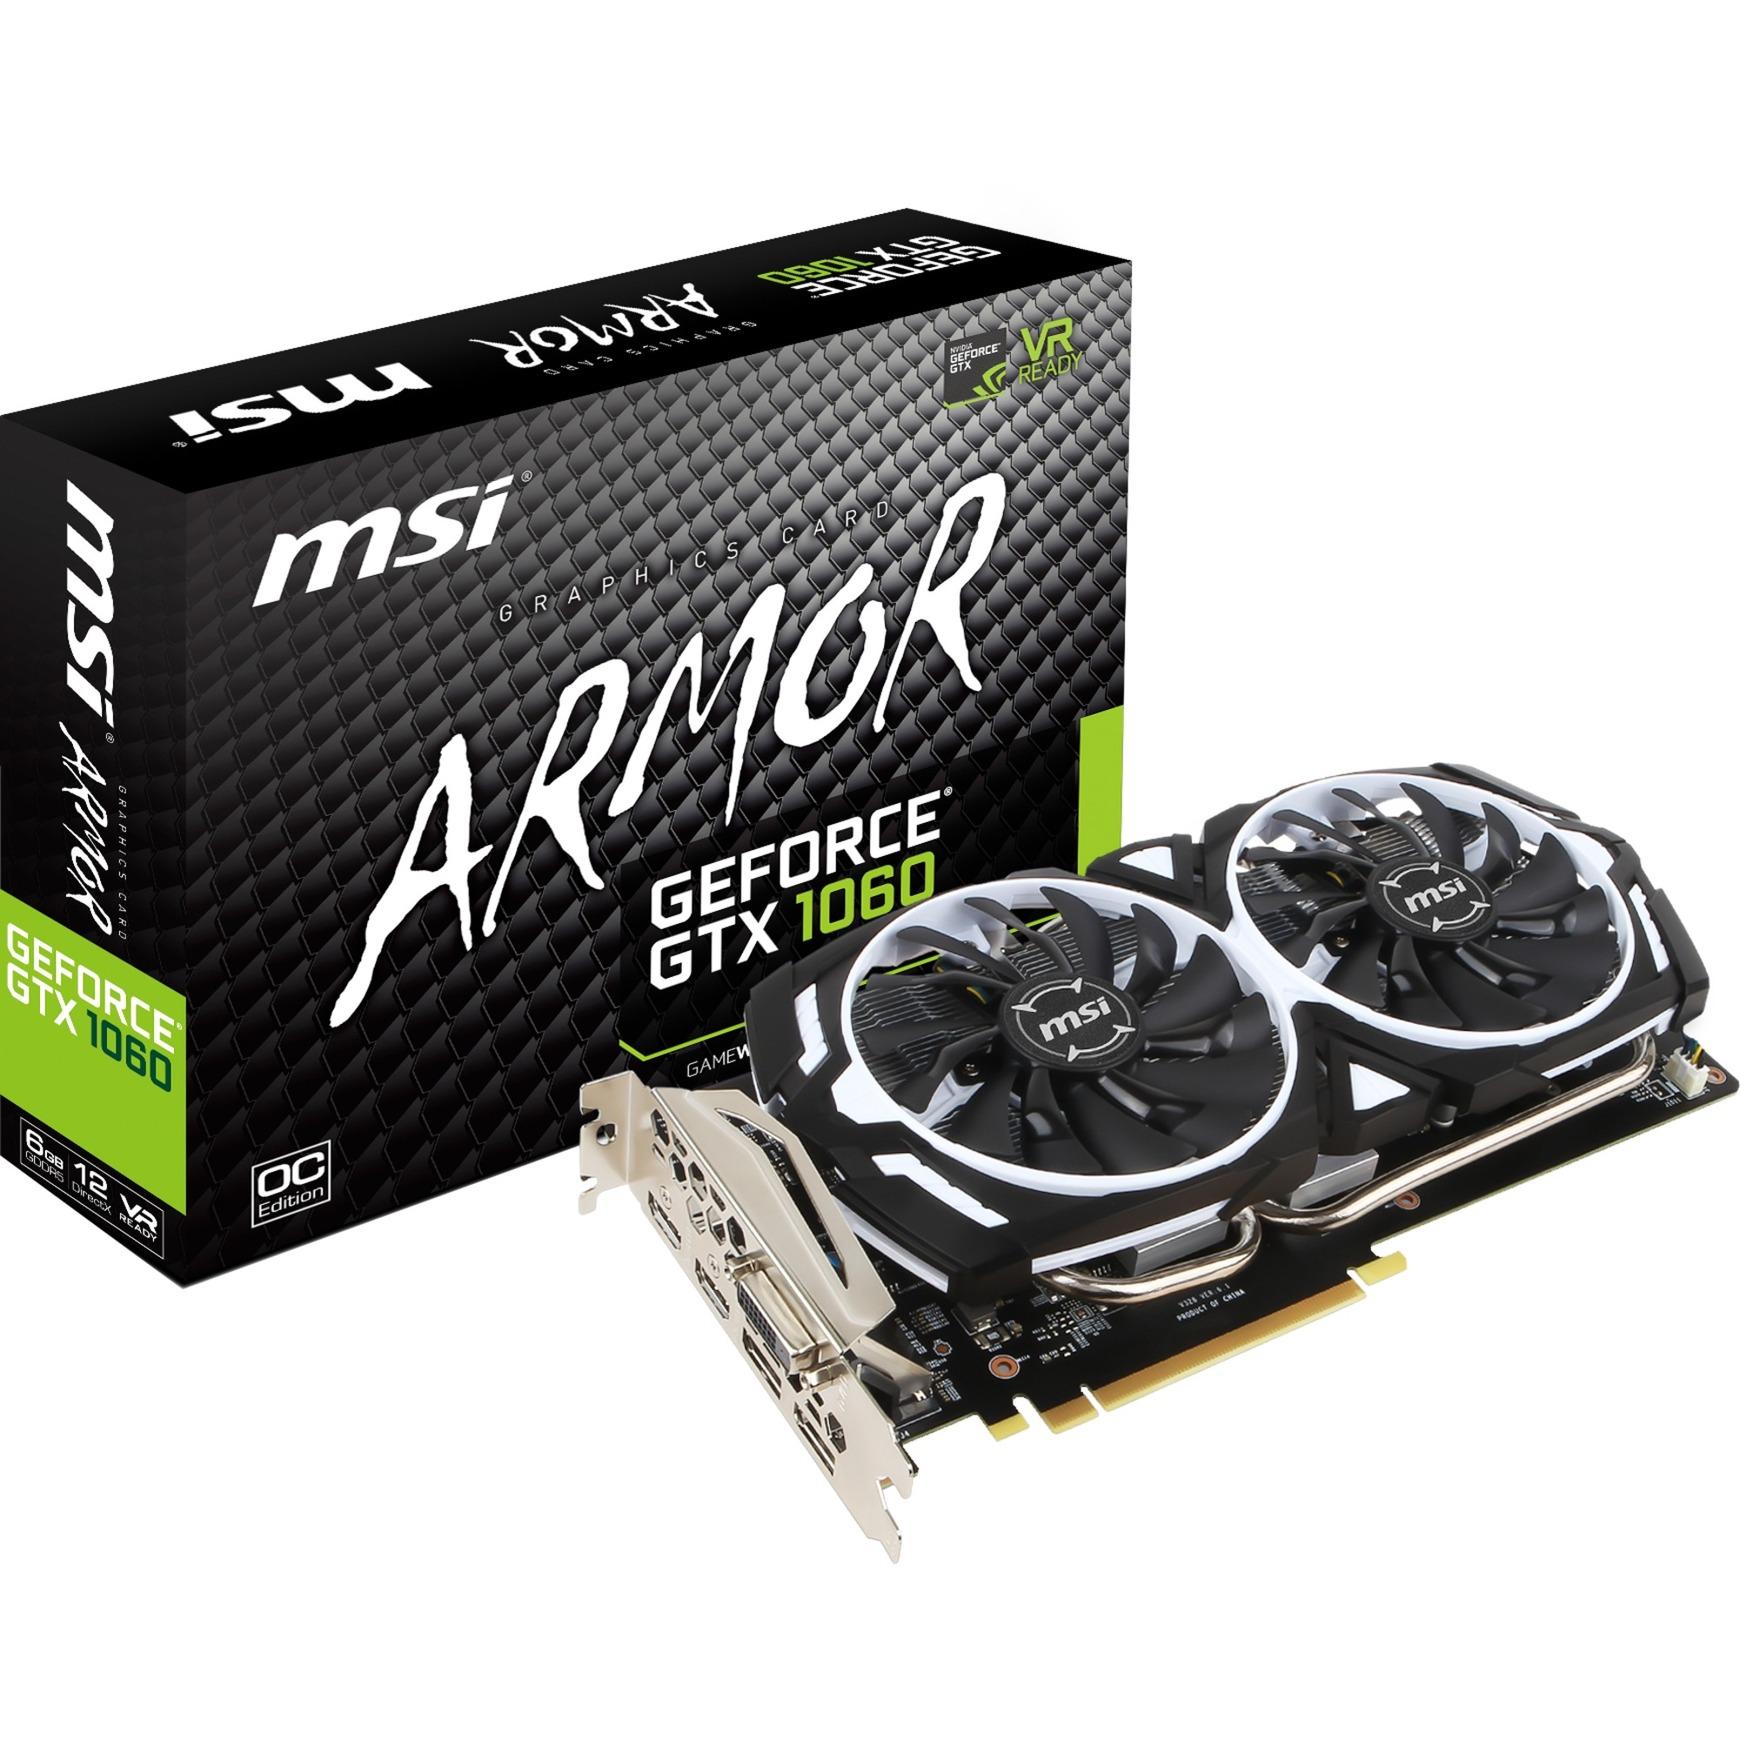 GeForce GTX 1060 ARMOR 6G OCV1 GeForce GTX 1060 6Go GDDR5, Carte graphique